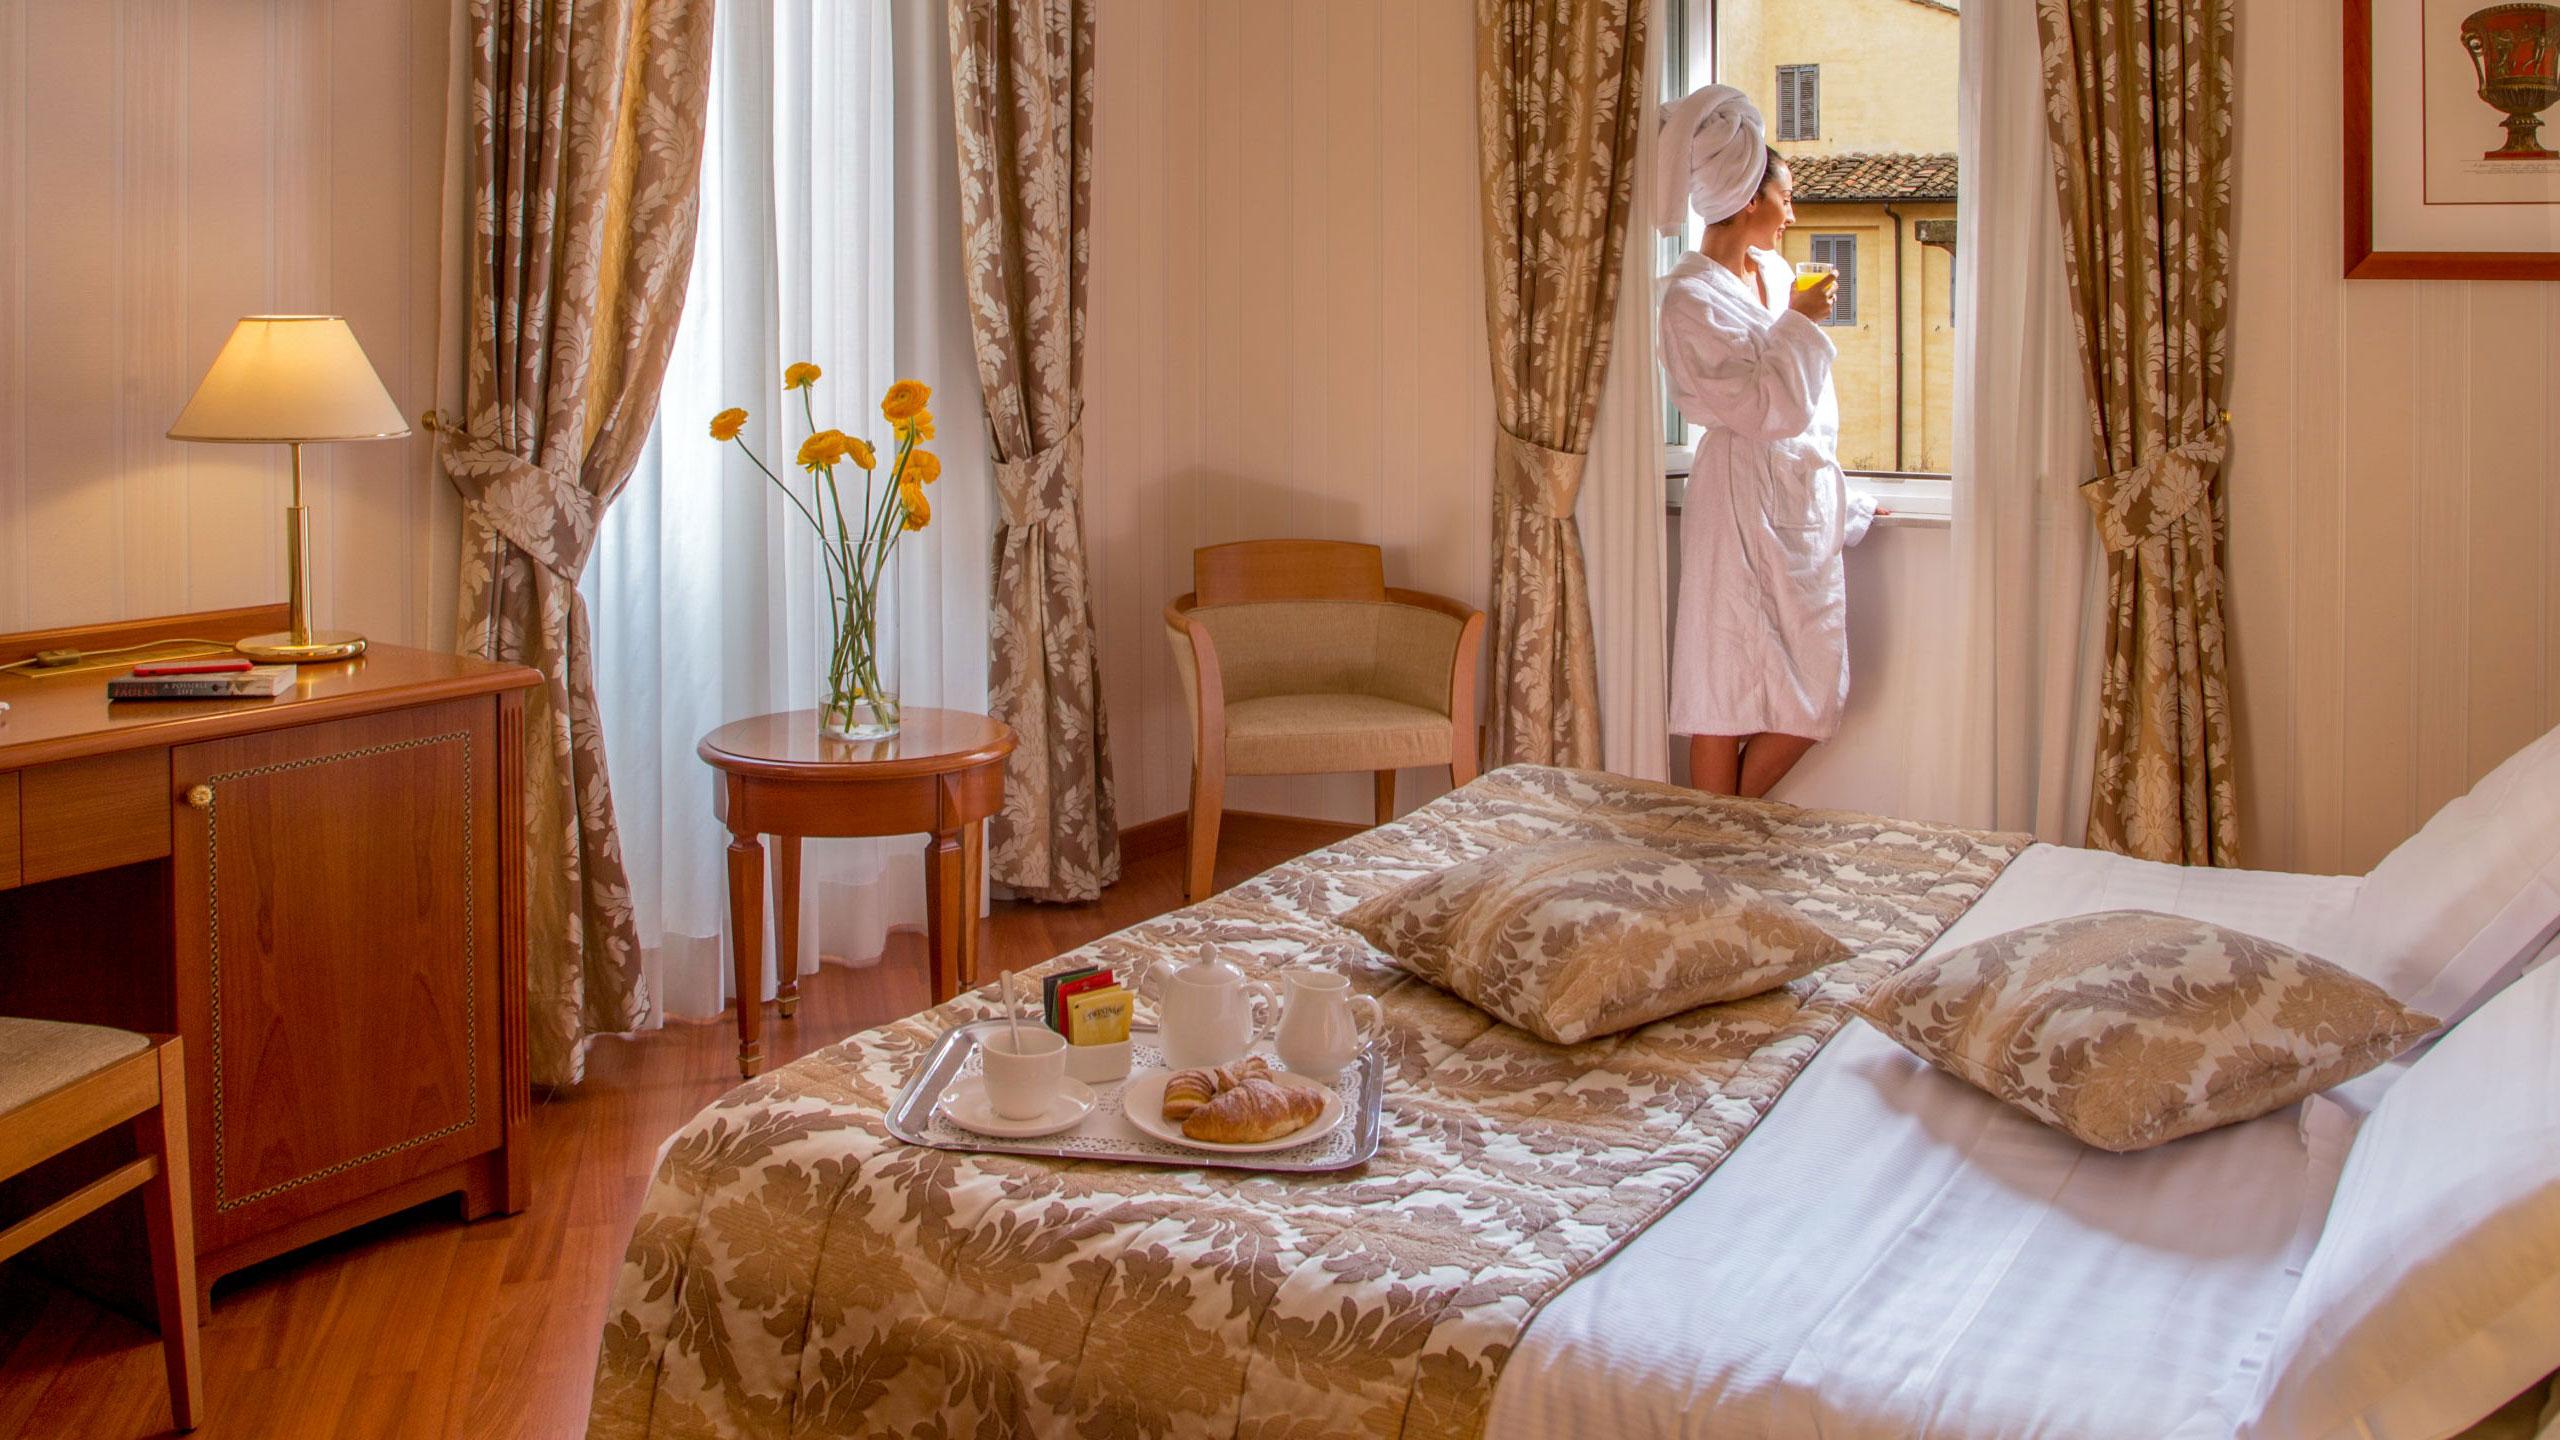 albergo-ottocento-rome-double-room-deluxe-25